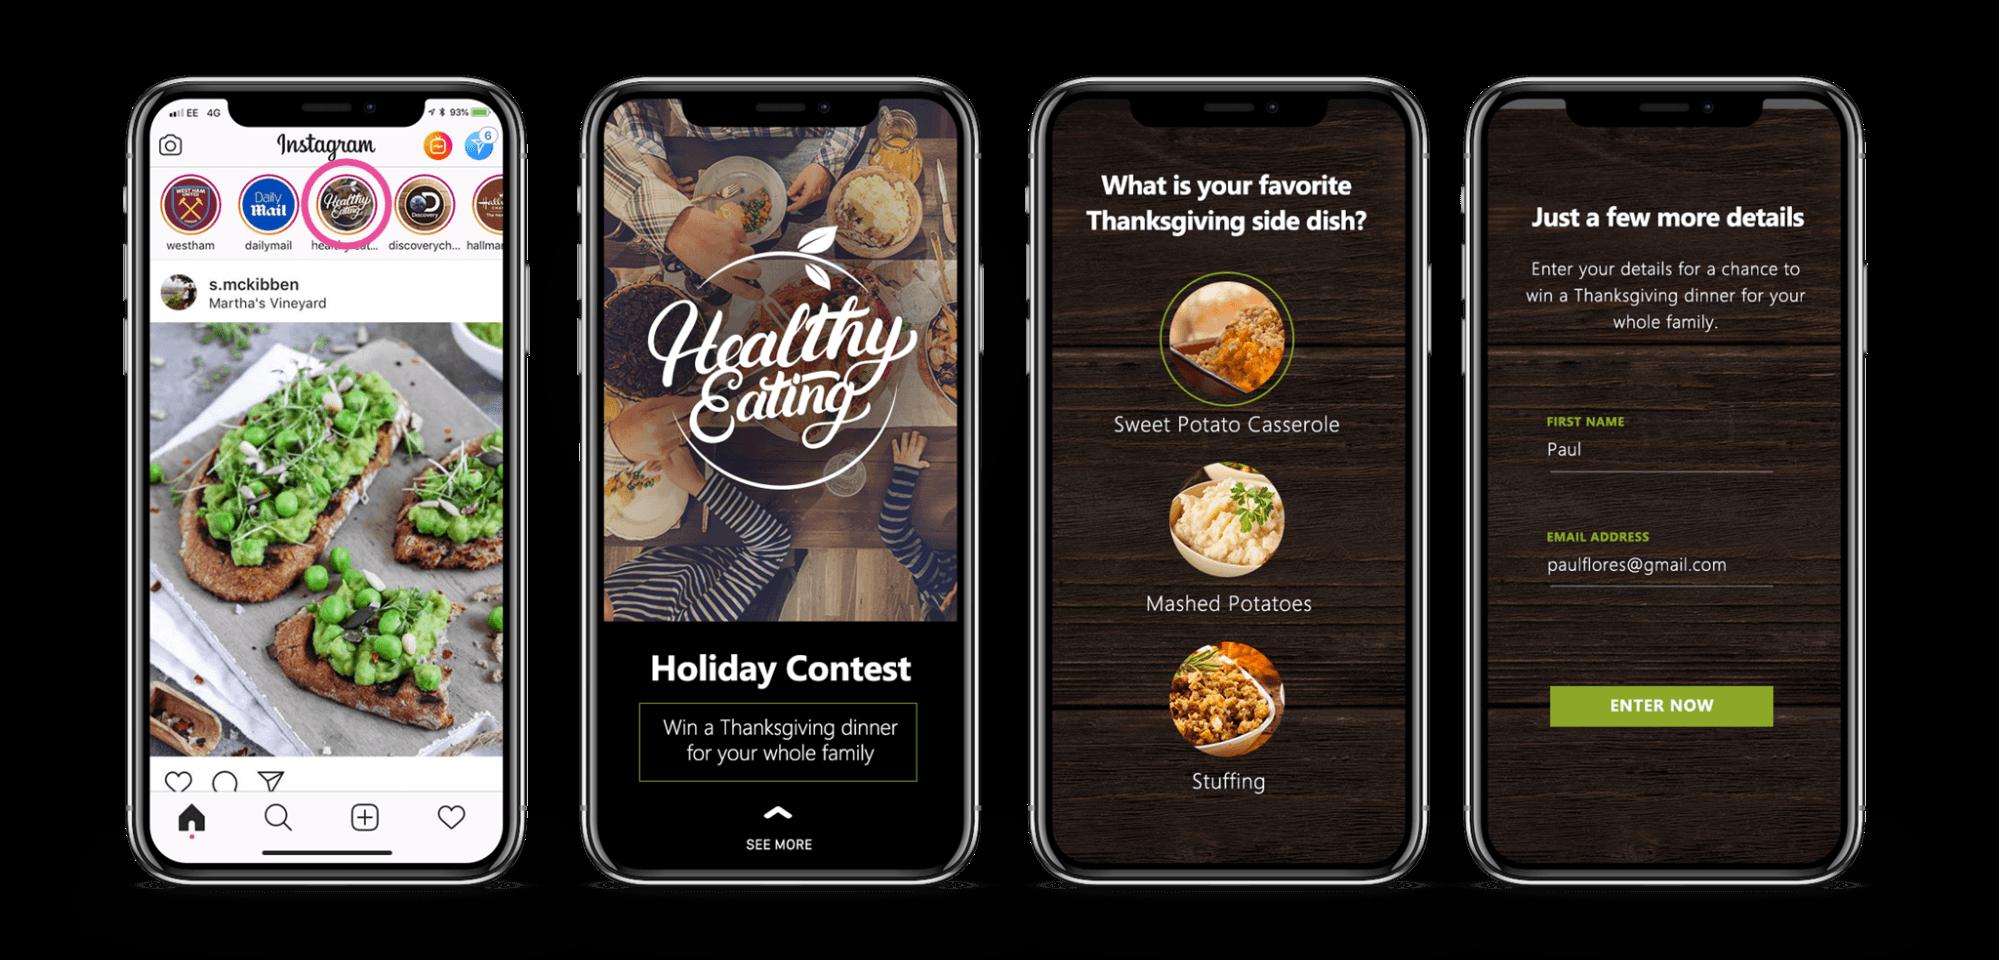 Instagram Stories Thanksgiving Marketing